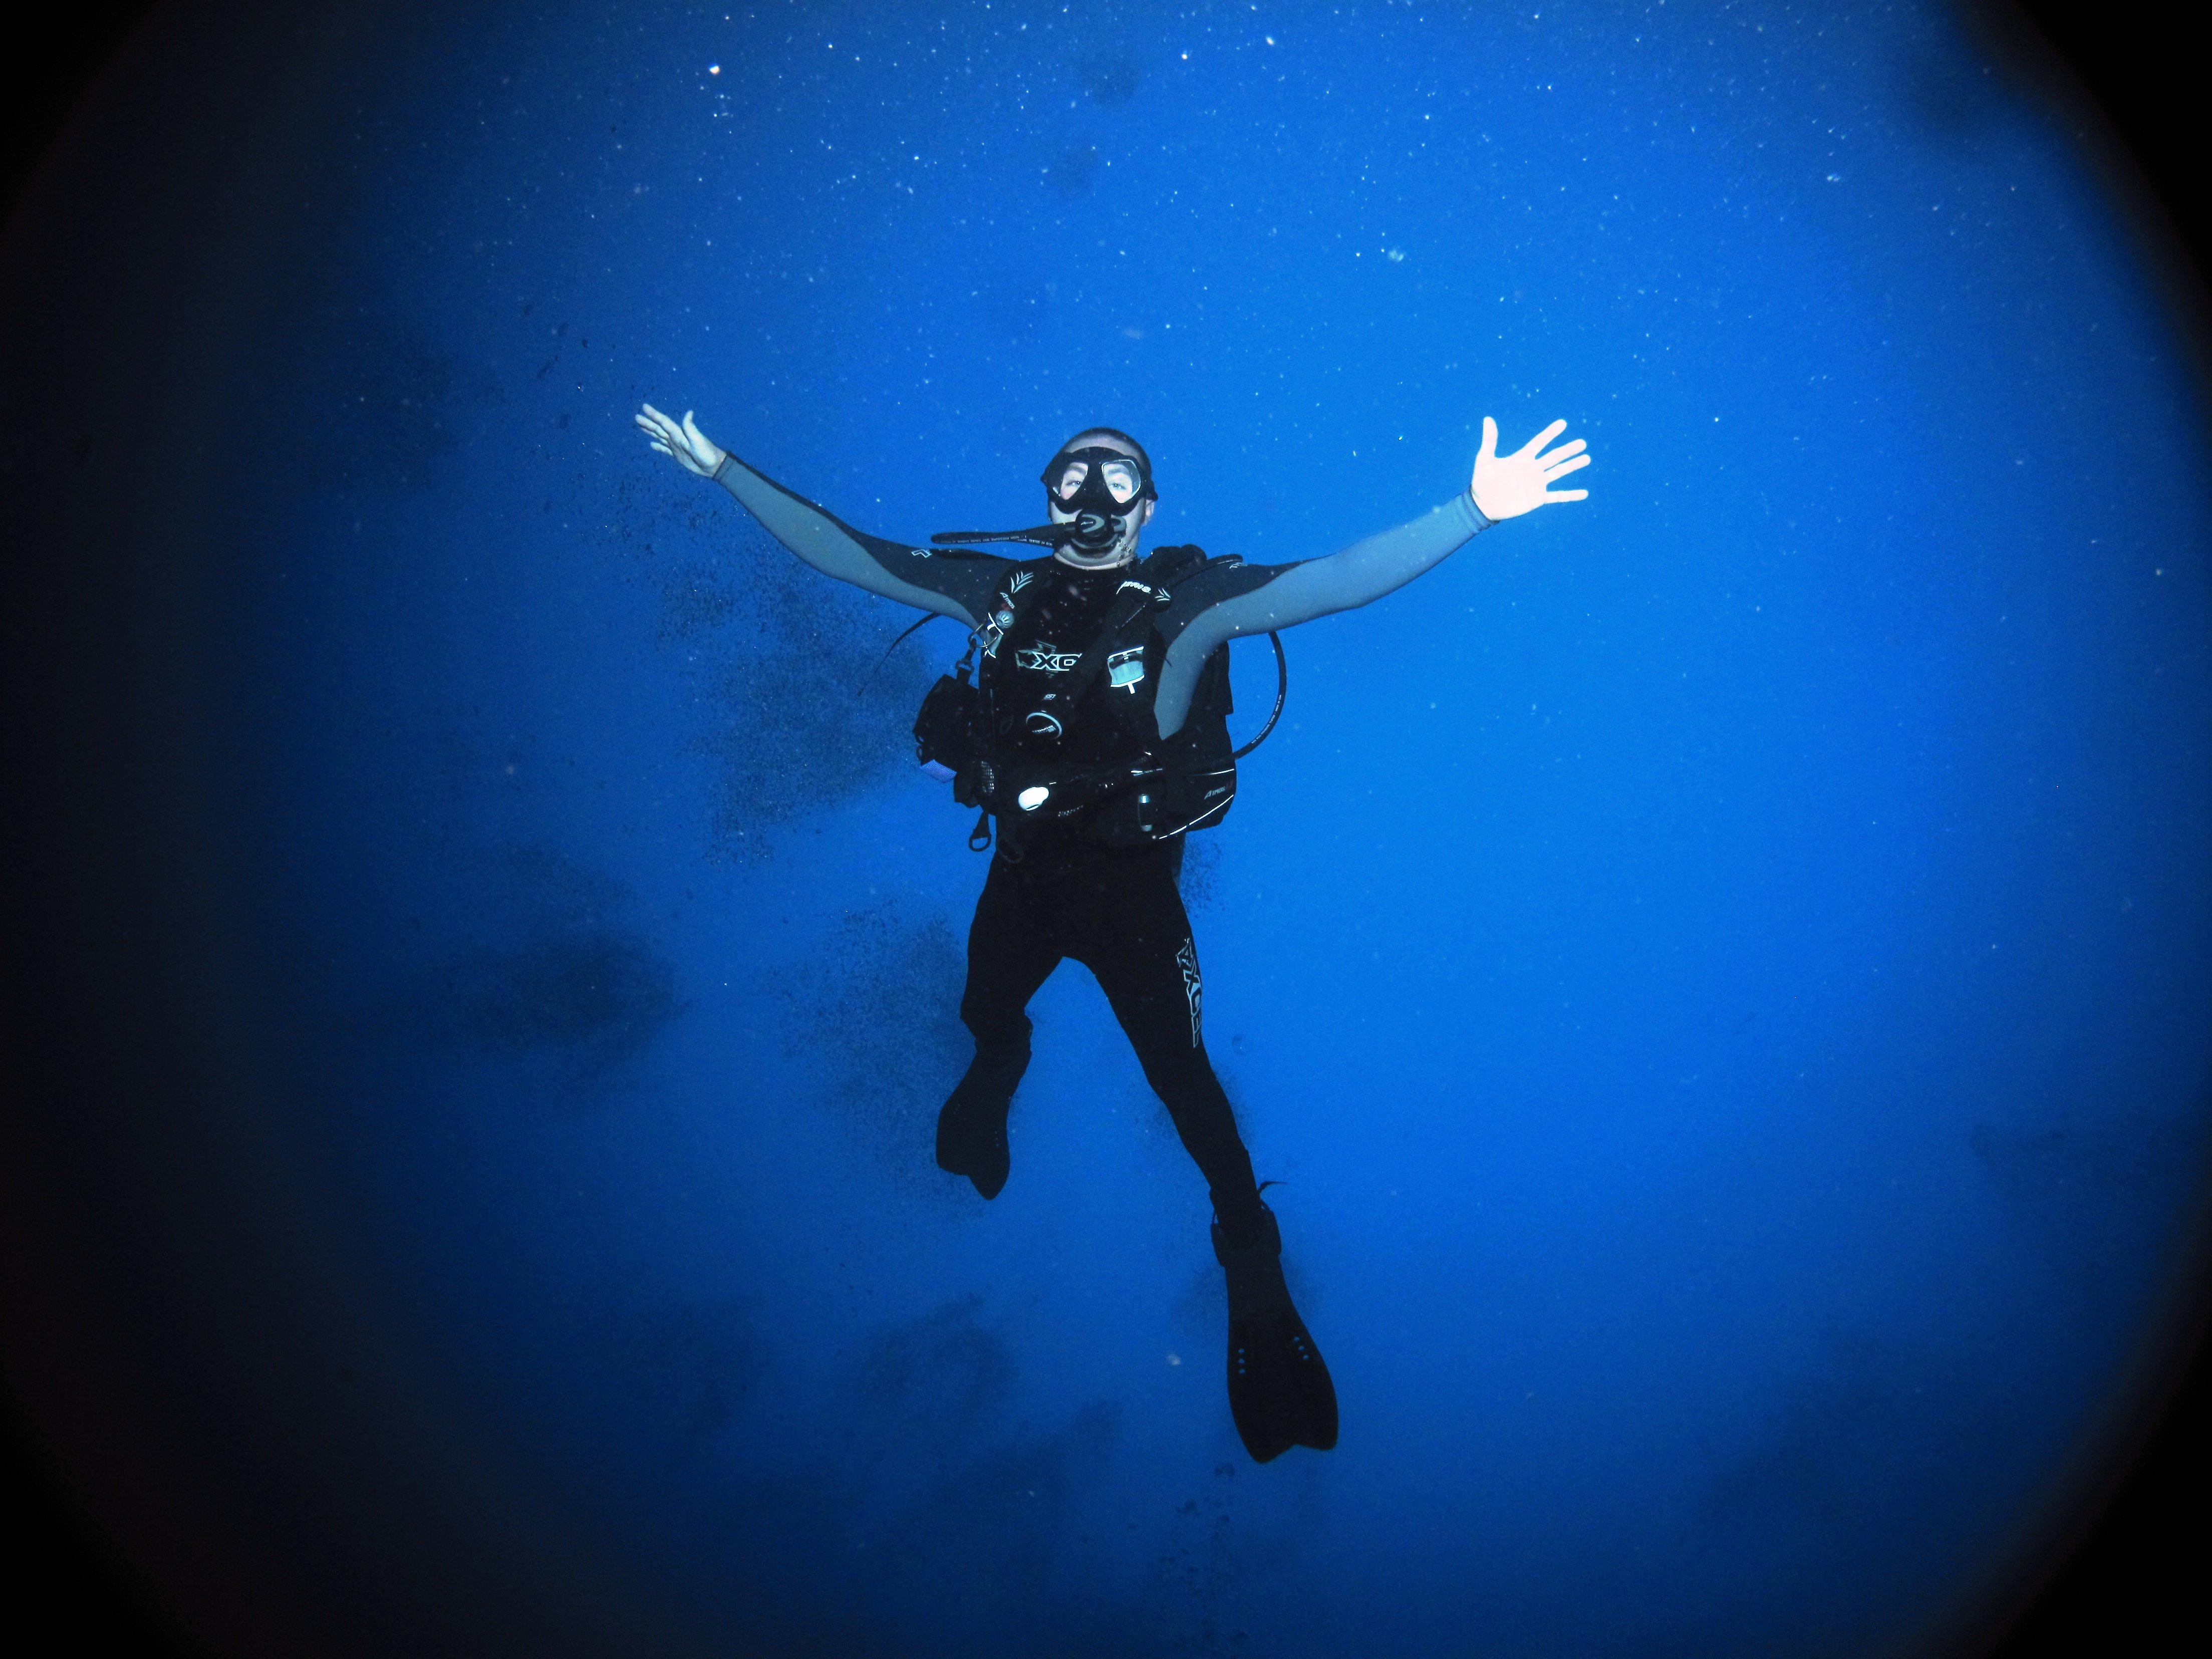 scuba diving wallpaper wallpapers - photo #47